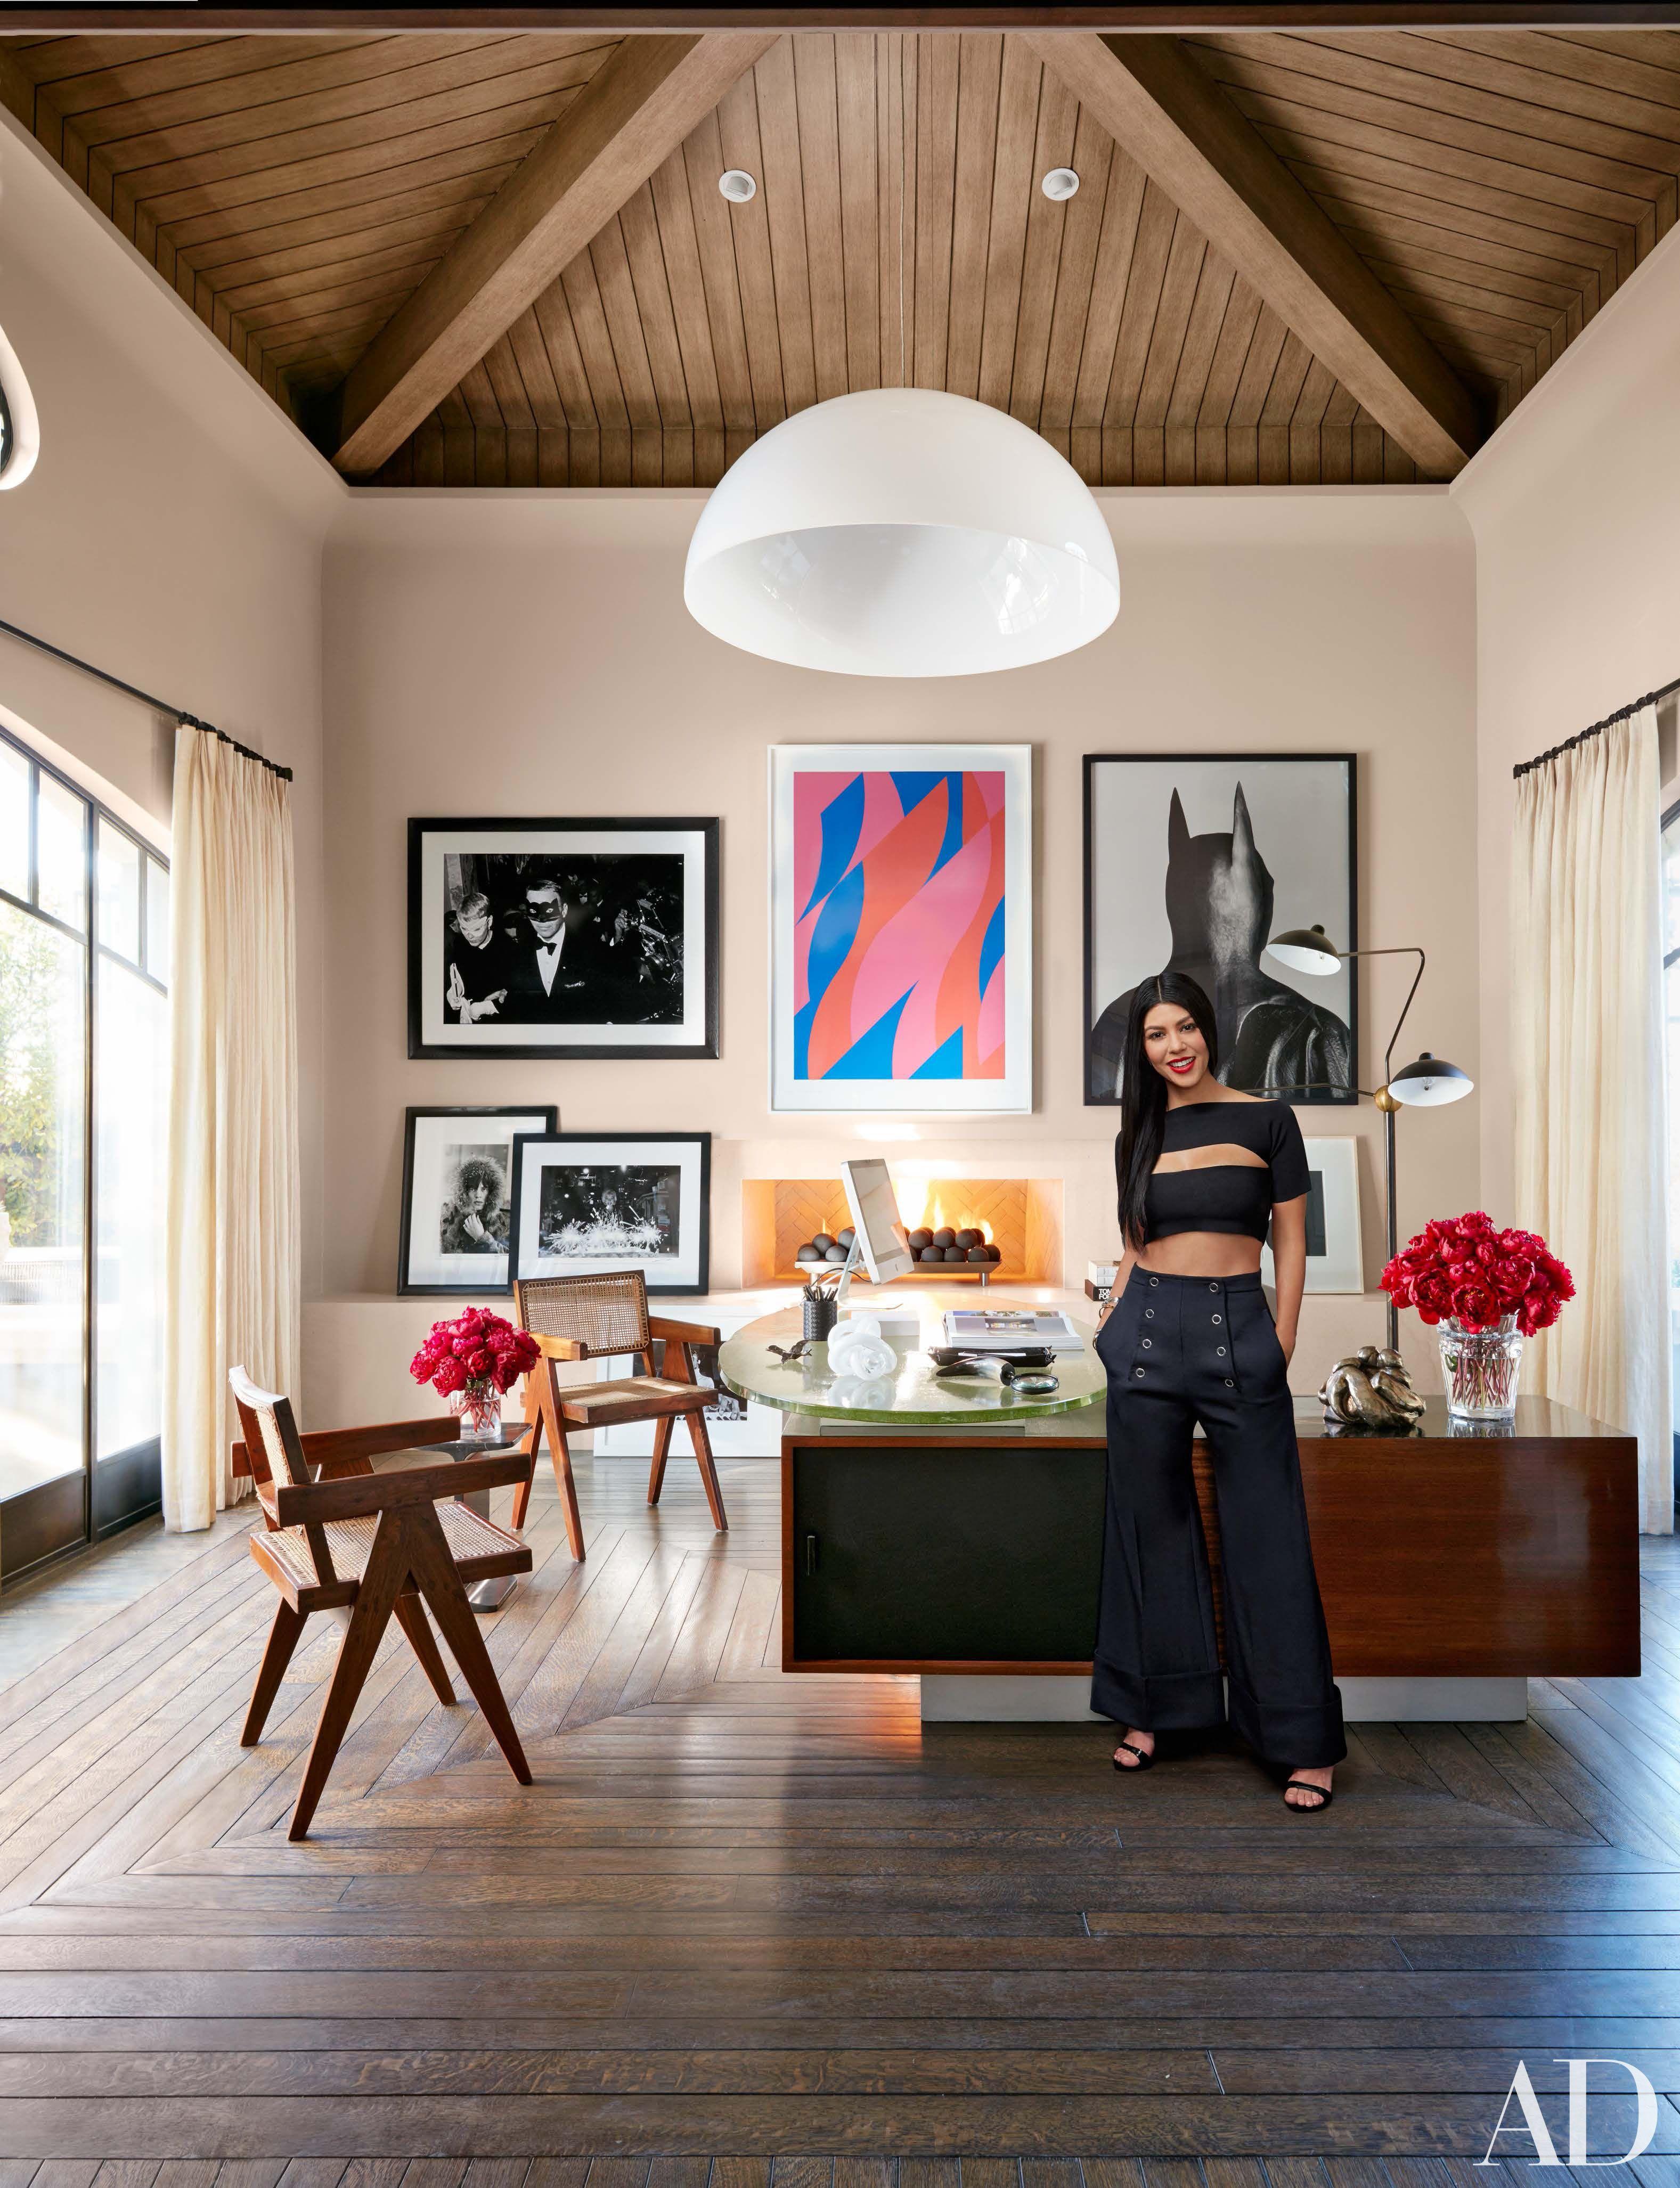 Khloe And Kourtney Kardashian Realize Their Dream Homes In California Kourtney Kardashian House Celebrity Houses Kardashian Home Khloe k living room